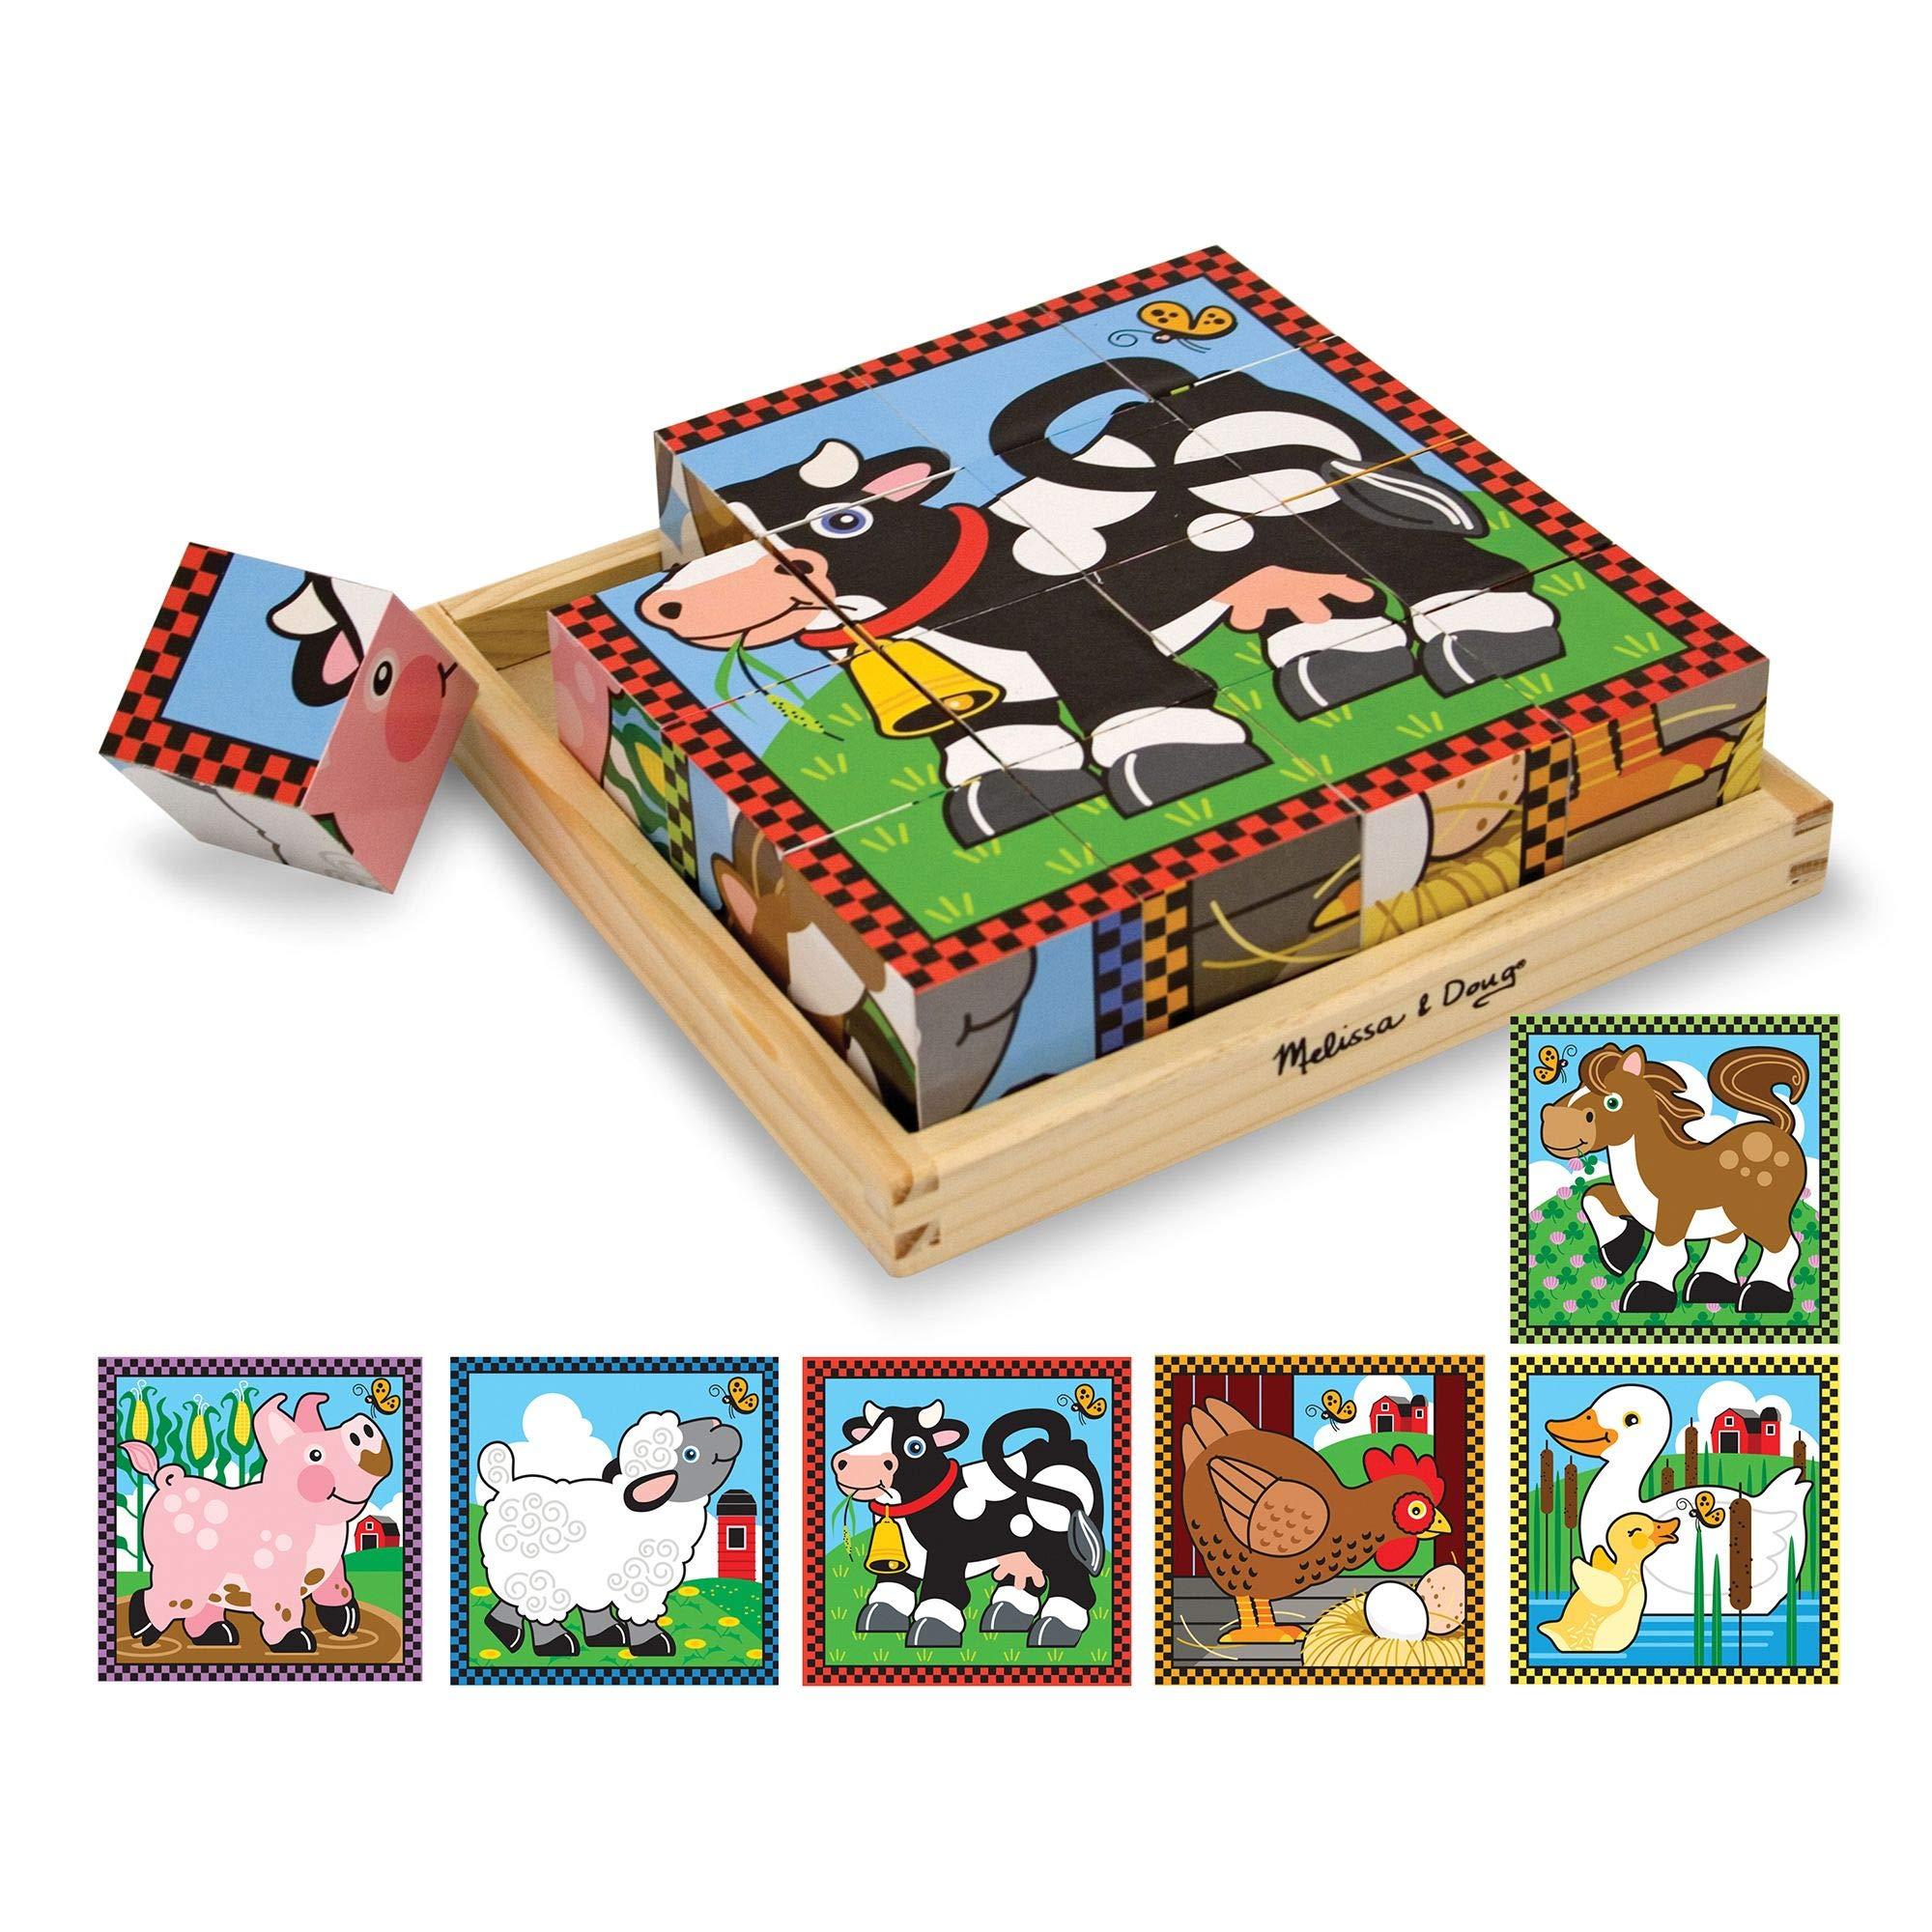 Melissa & Doug Farm Cube Puzzle (Preschool Kids, Six Puzzles in One, Sturdy Wooden Construction, 16 Cubes and Wooden Tray, 20.32 cm H x 20.32 cm W x 5.715 cm L)